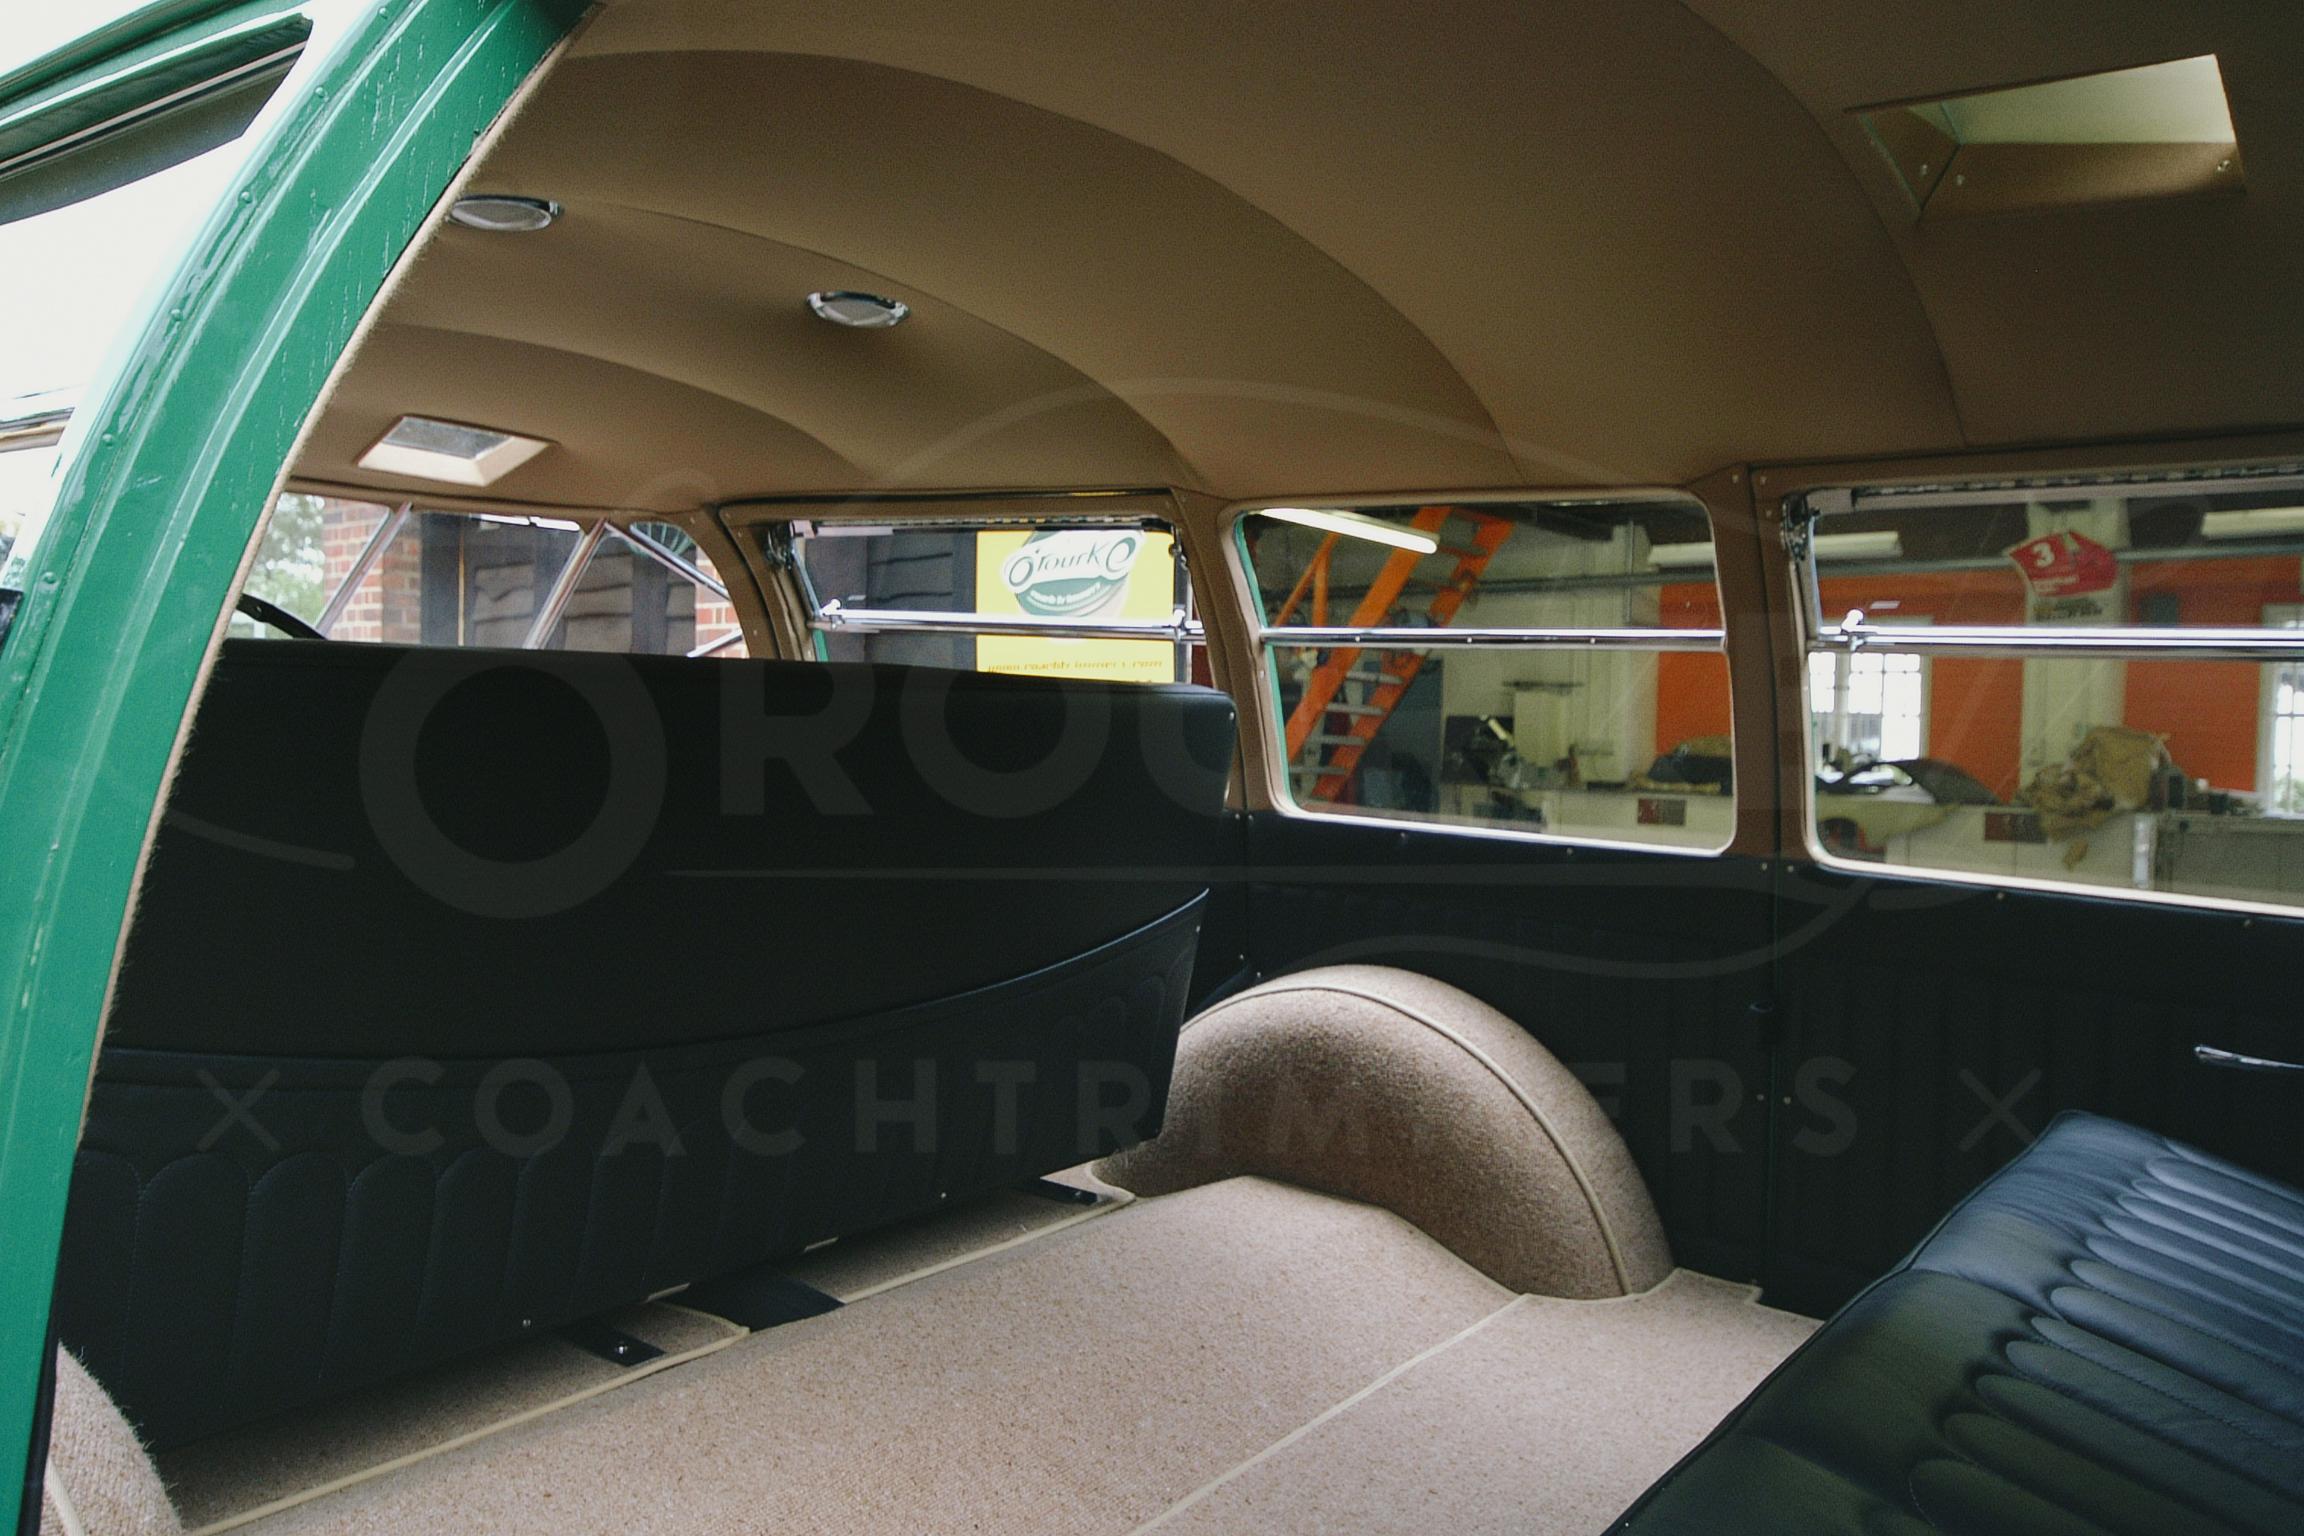 o-rourke-coachtrimmers-dymaxion-car-3-3.jpg